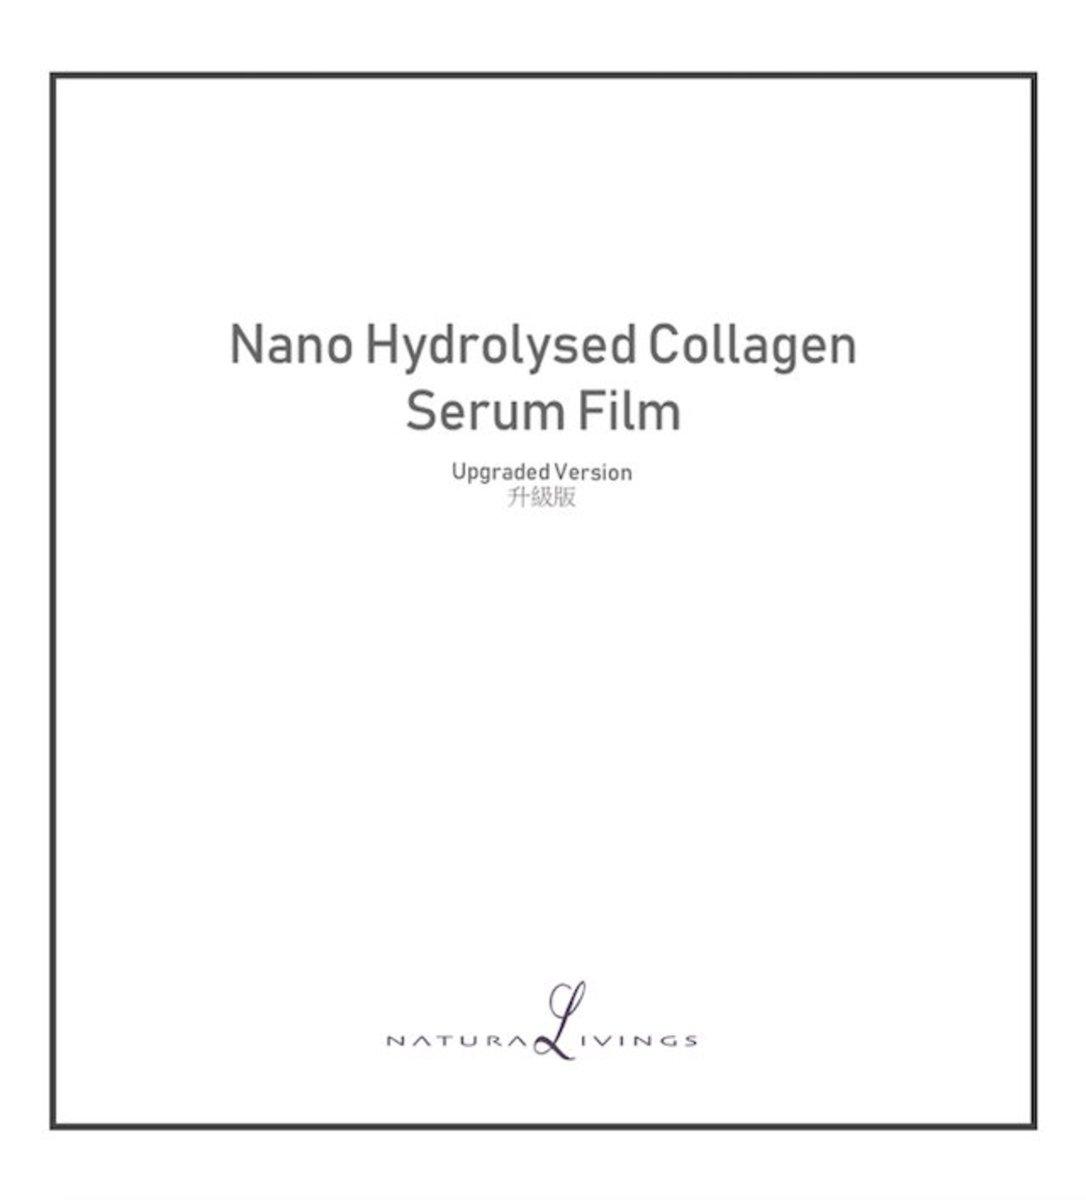 Nano Hydrolysed Collagen Serum Film (20 + 6pcs)